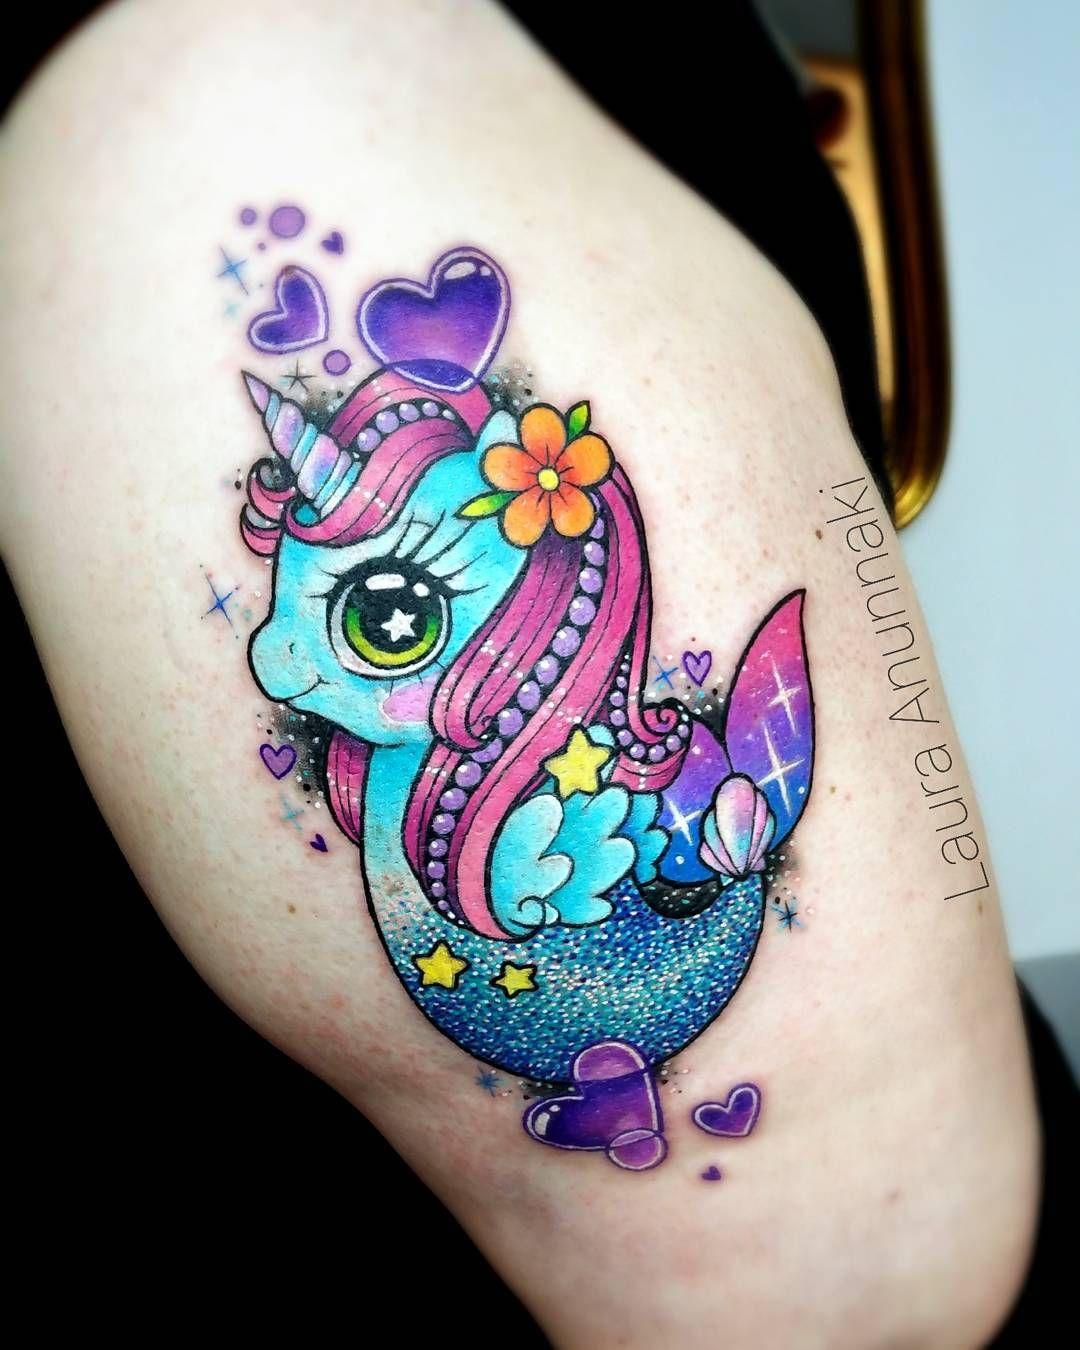 Pin By Laura Kuley On Tattoo: Cute & Cool Tattoos